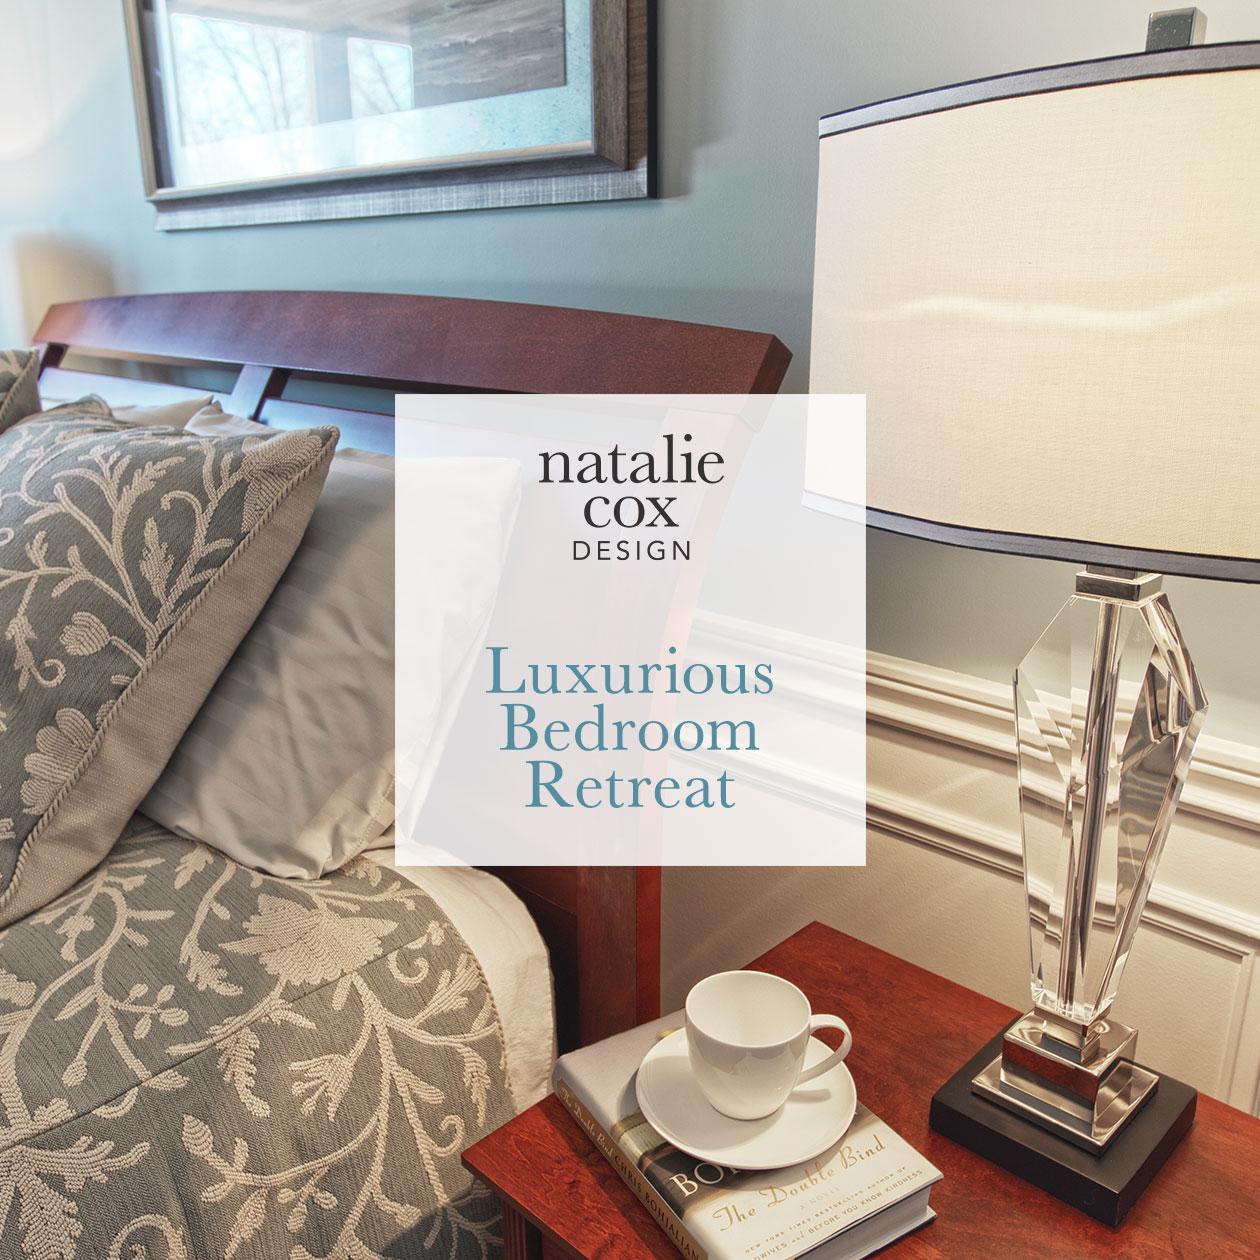 Luxurious Bedroom Retreat - Natalie Cox Design - Interior Decorator - Ottawa, ON